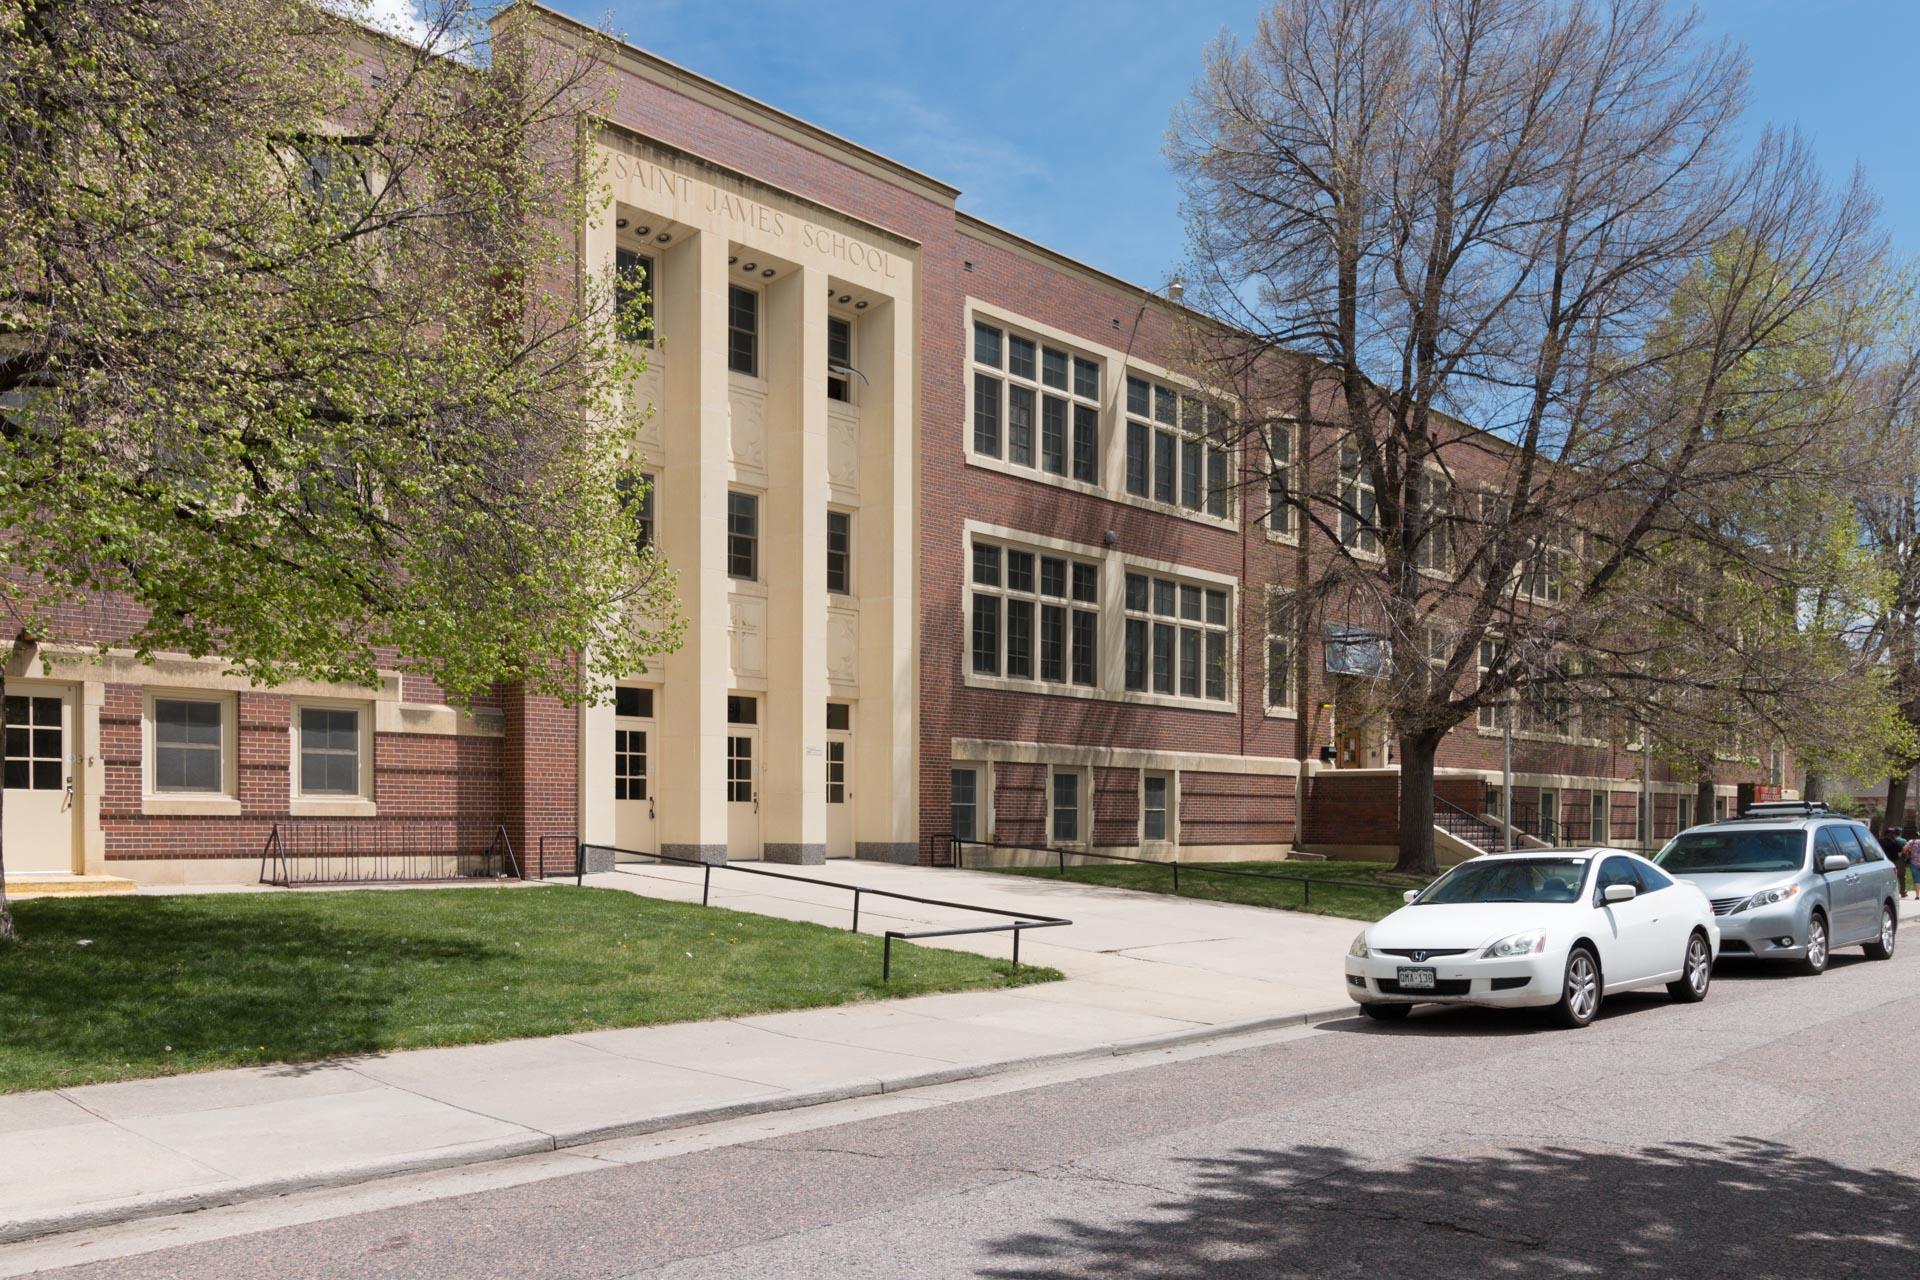 St. James Roman Catholic School in Montclair.